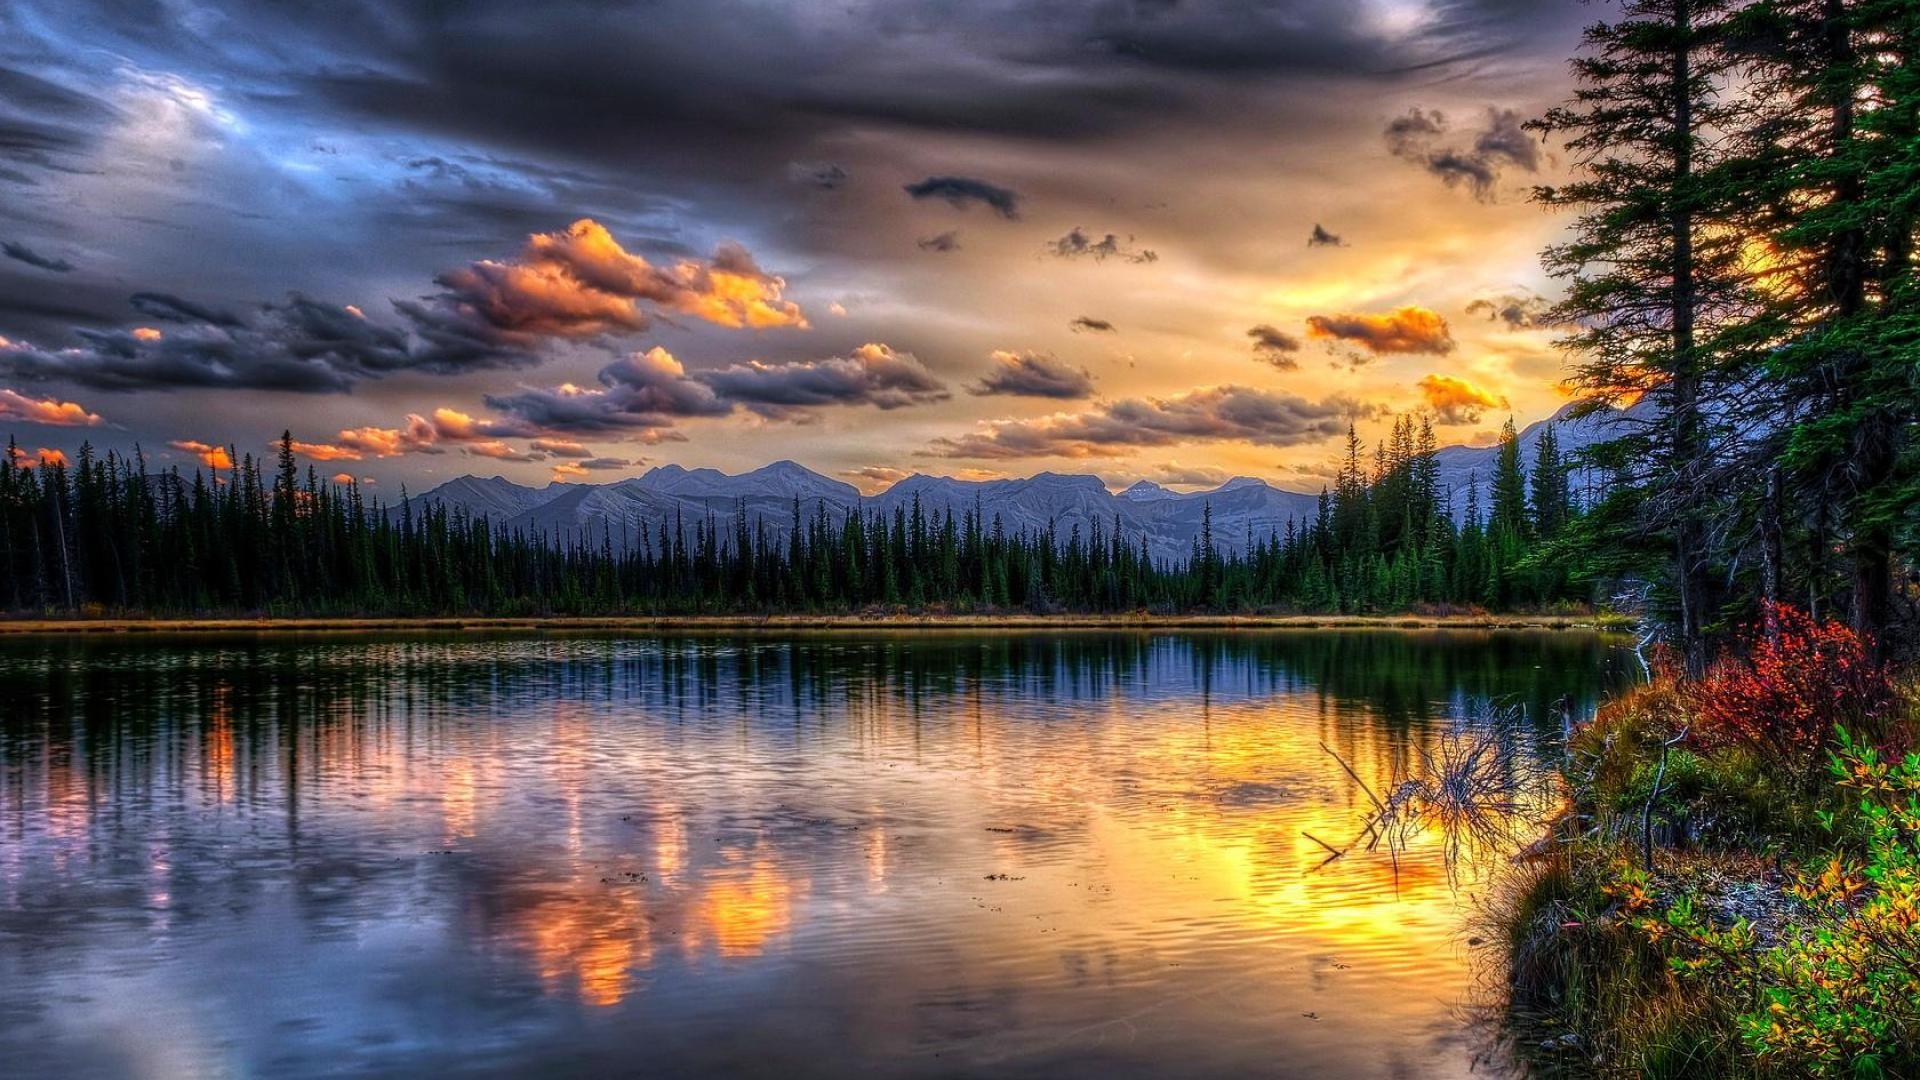 164 1644559 most beautiful mountain view landscape desktop wallpaper landscape